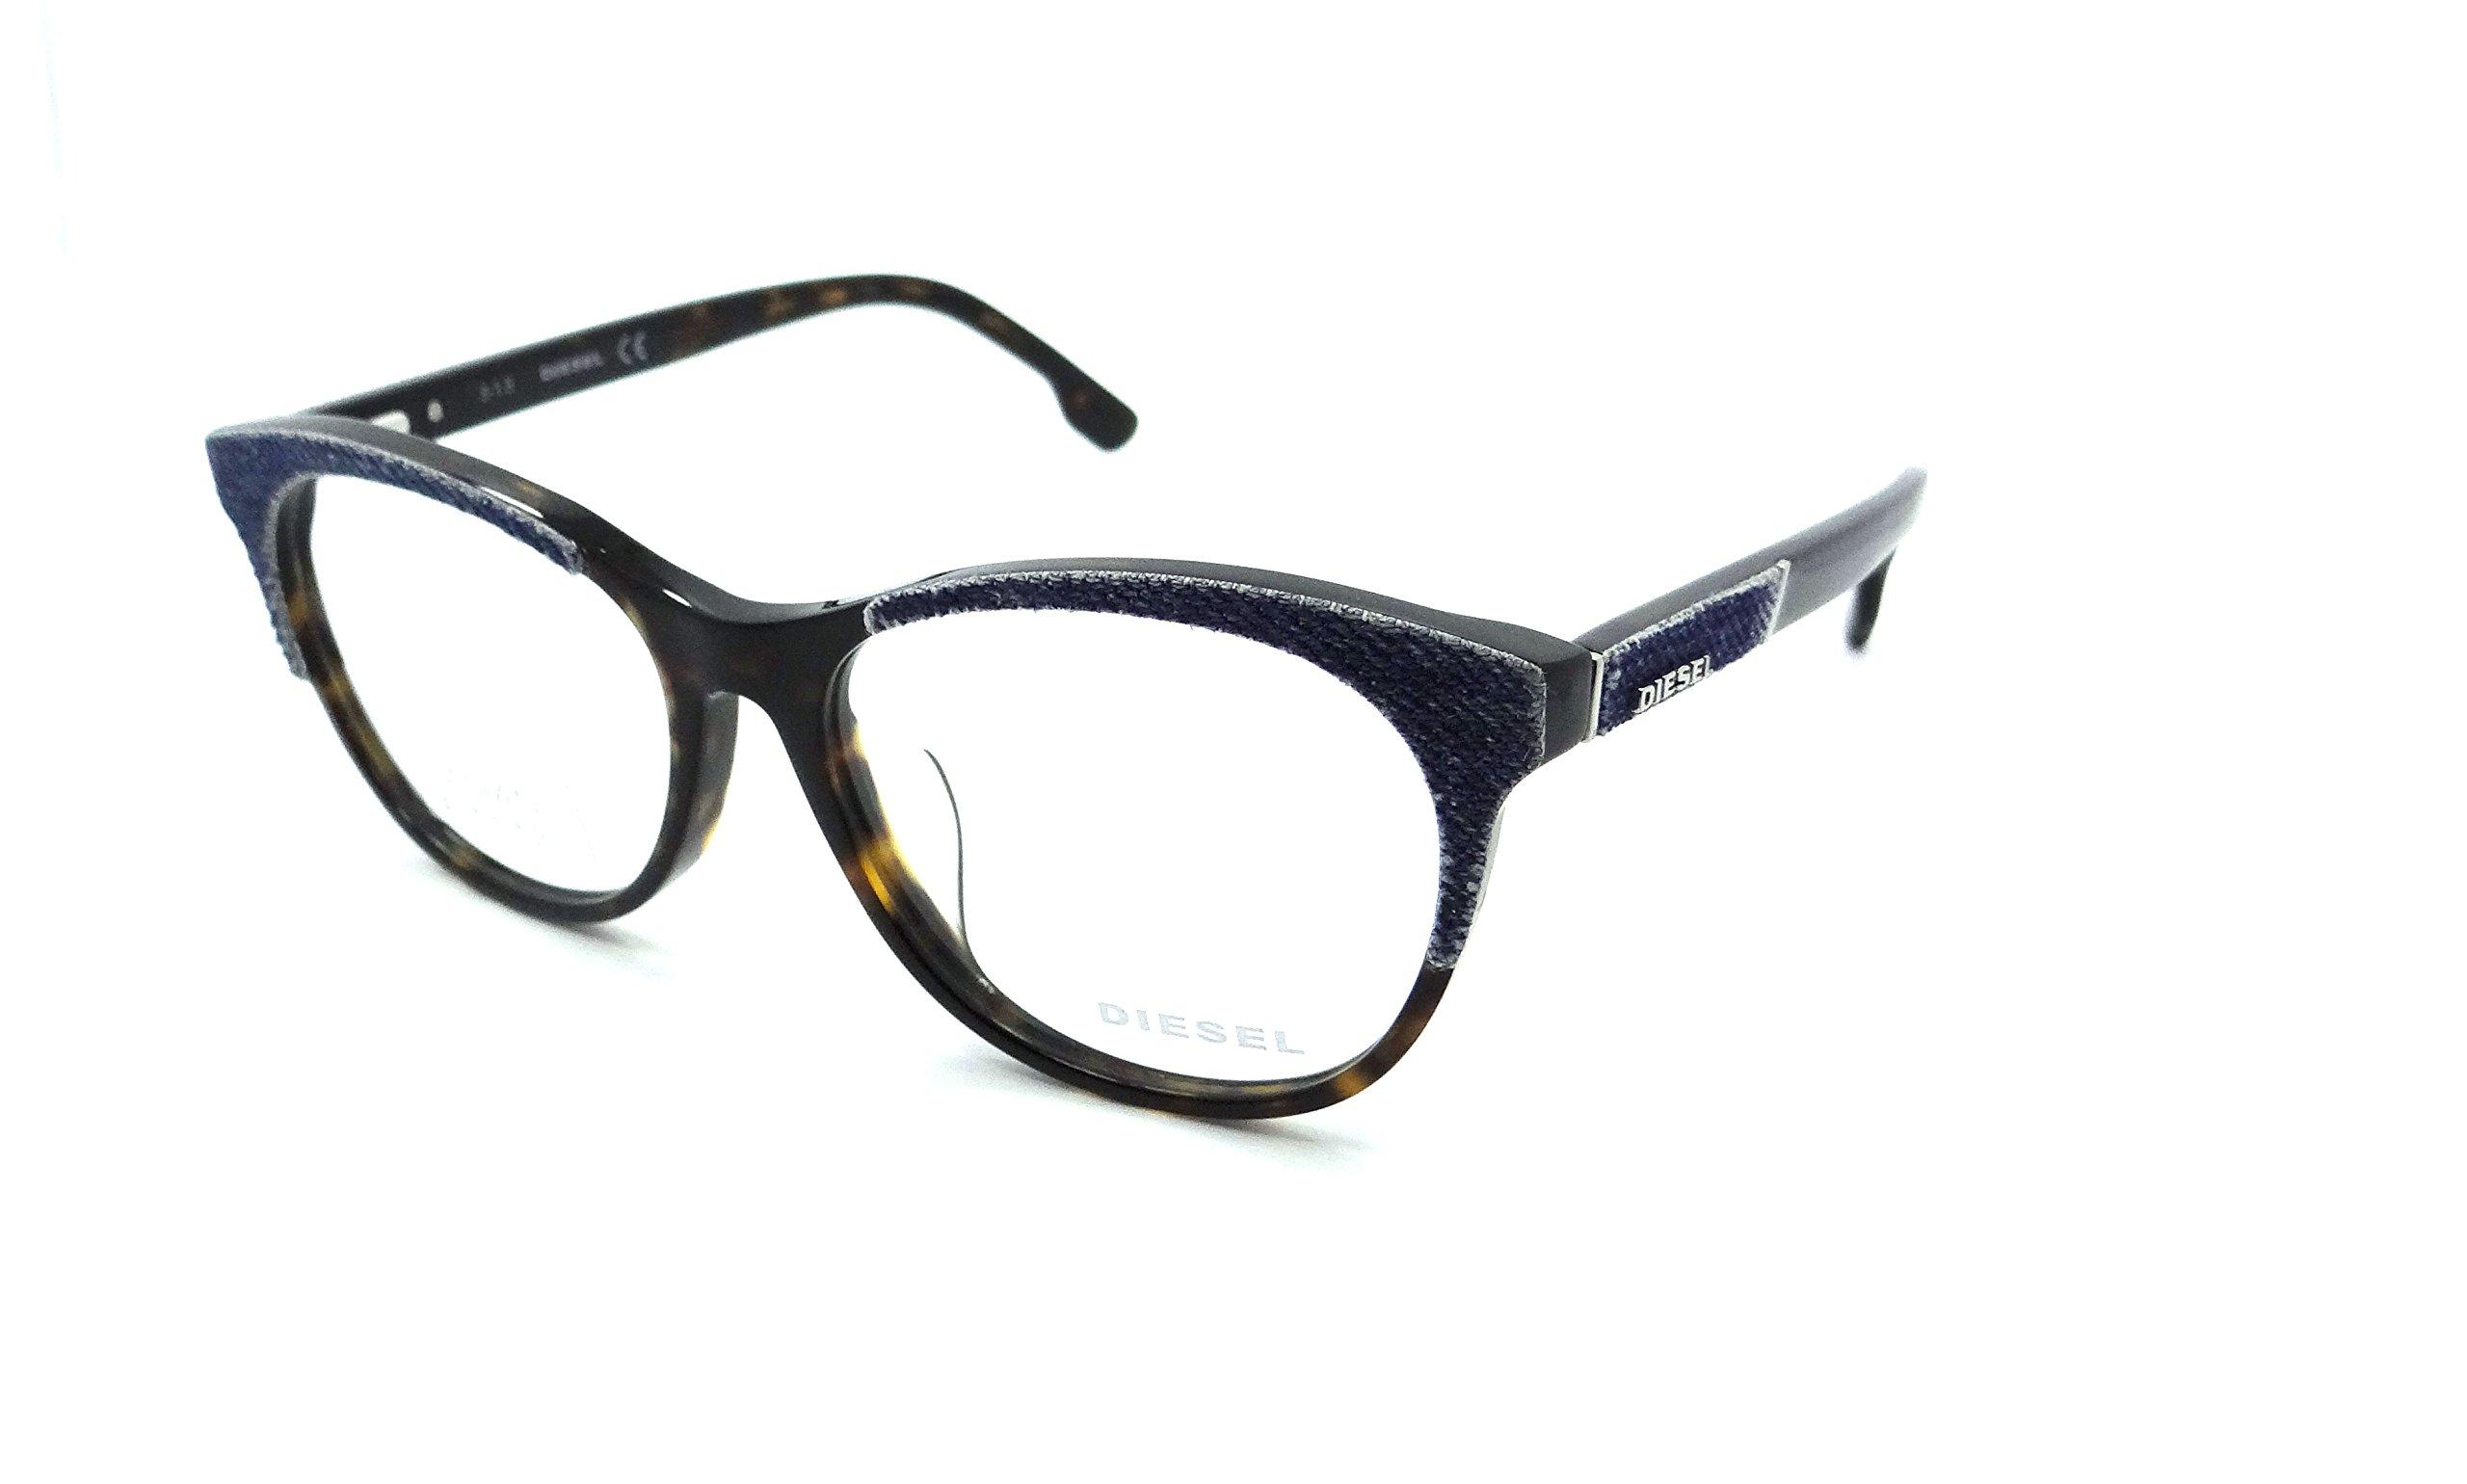 Diesel Rx Eyeglasses Frames DL5155-F 052 56-16-145 Blue Denim / Havana Asian Fit